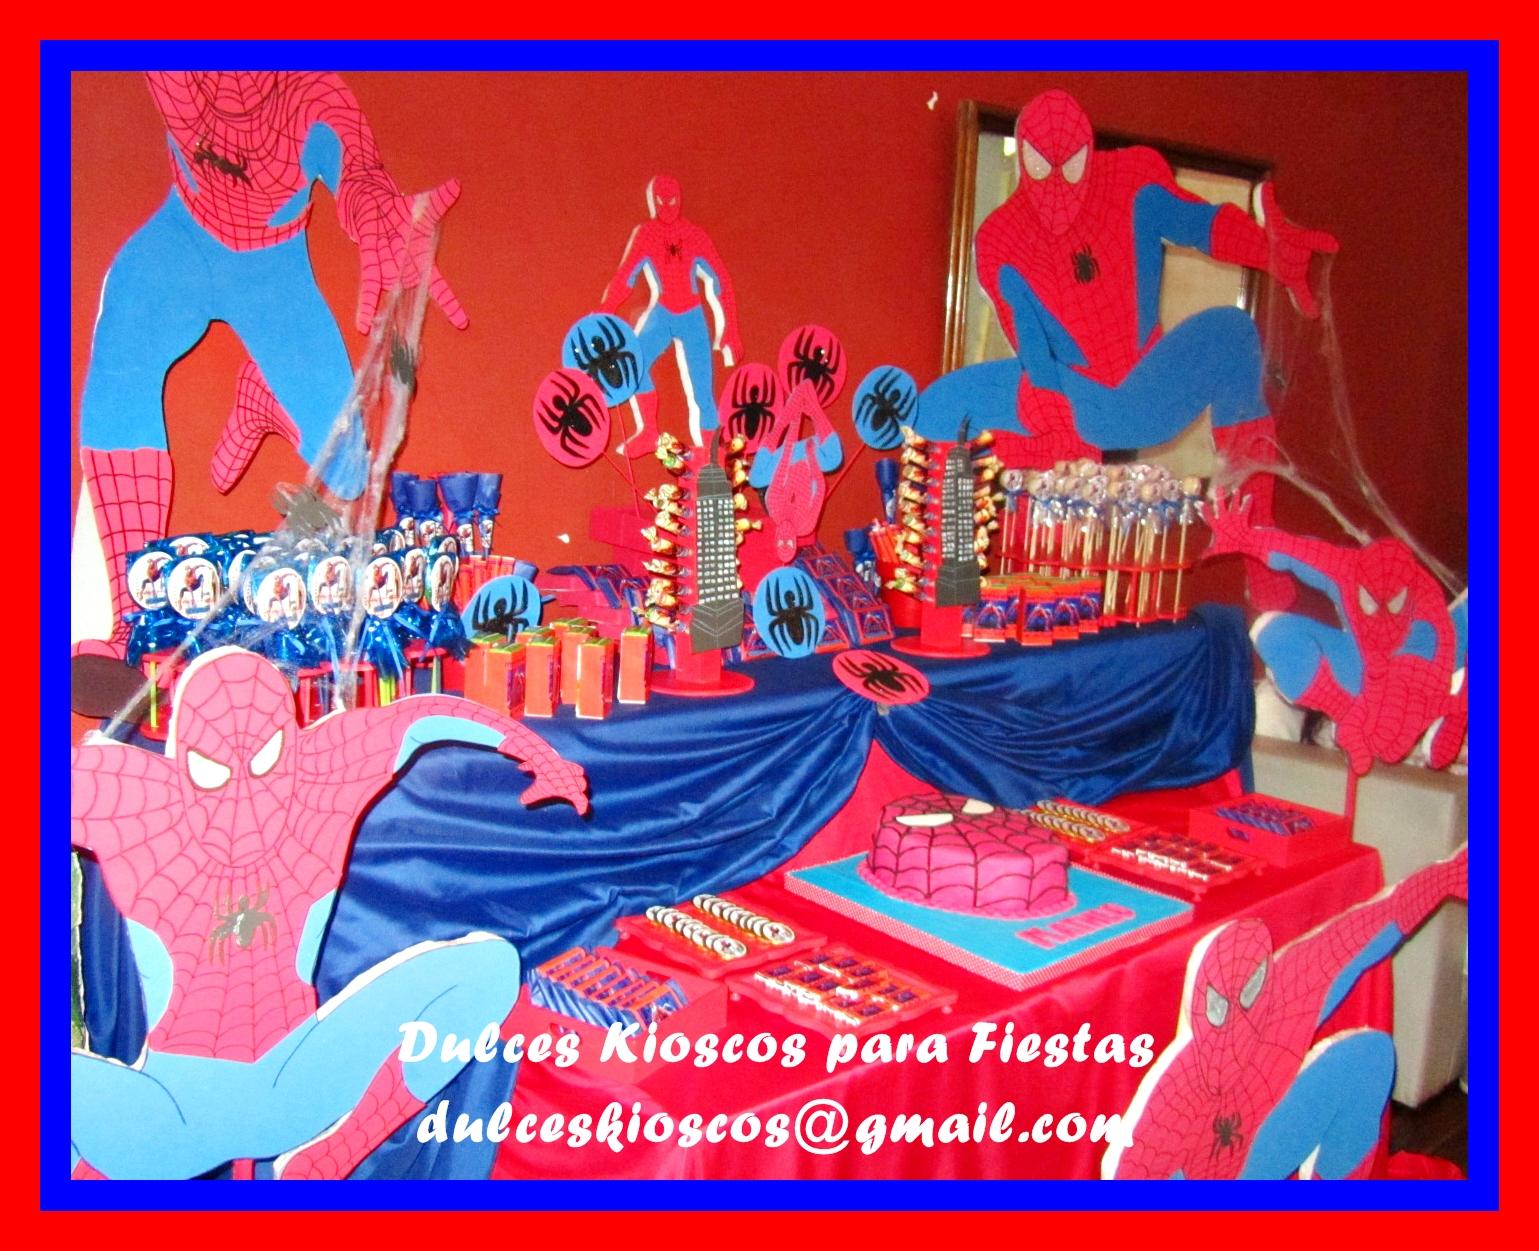 Dulces kioscos para fiestas tematica del hombre ara a for Cuartos decorados hombre arana